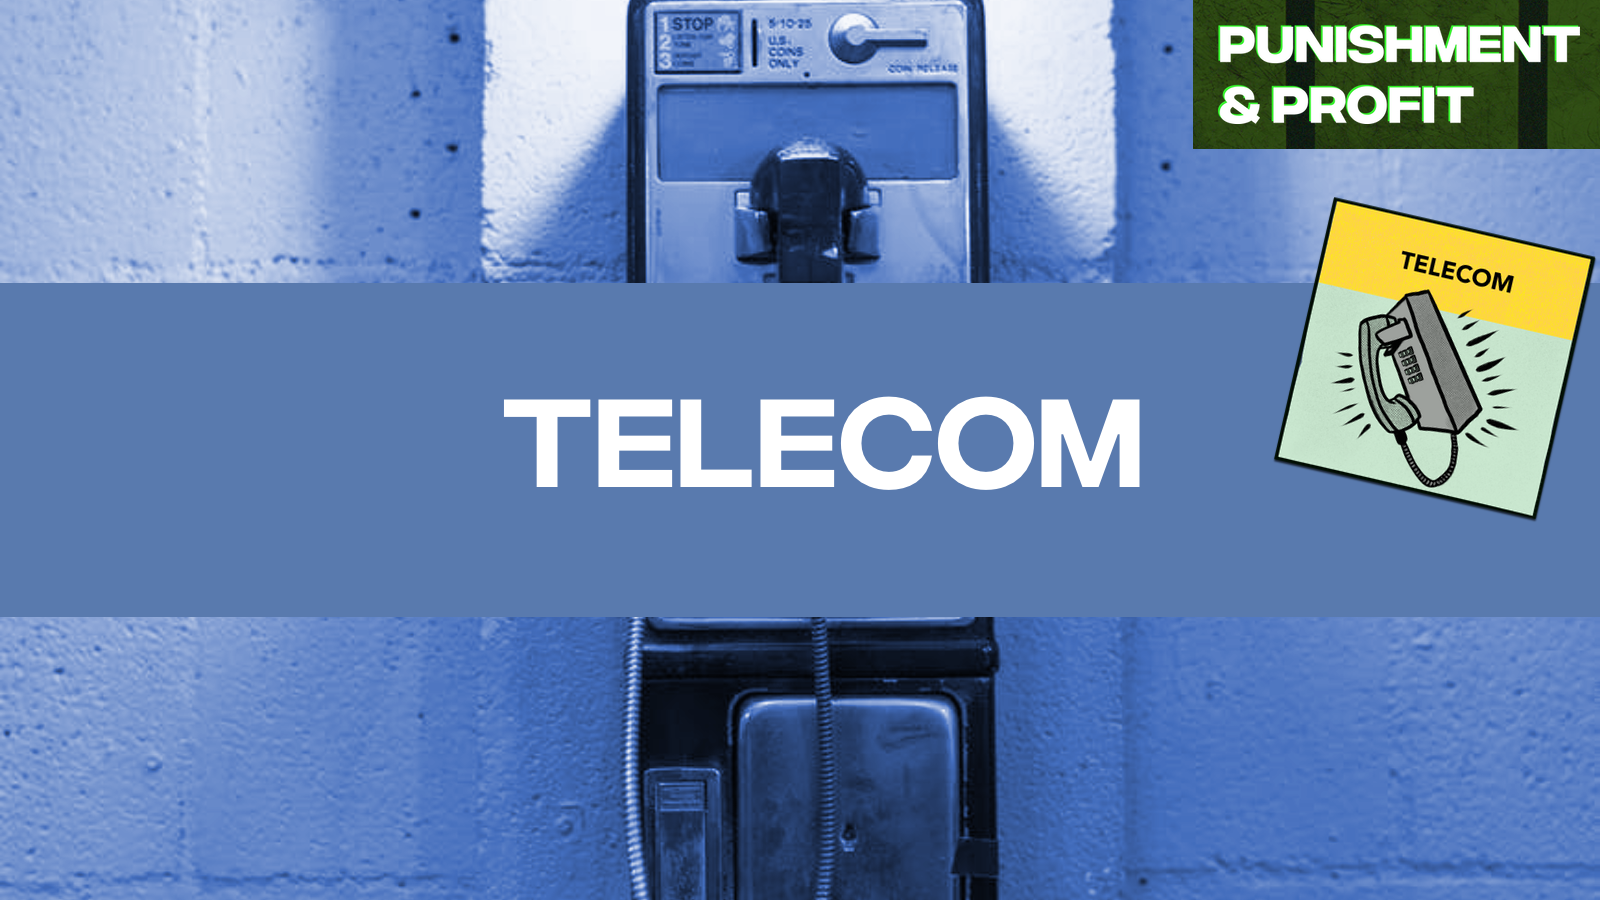 Punishment & Profit: Telecom